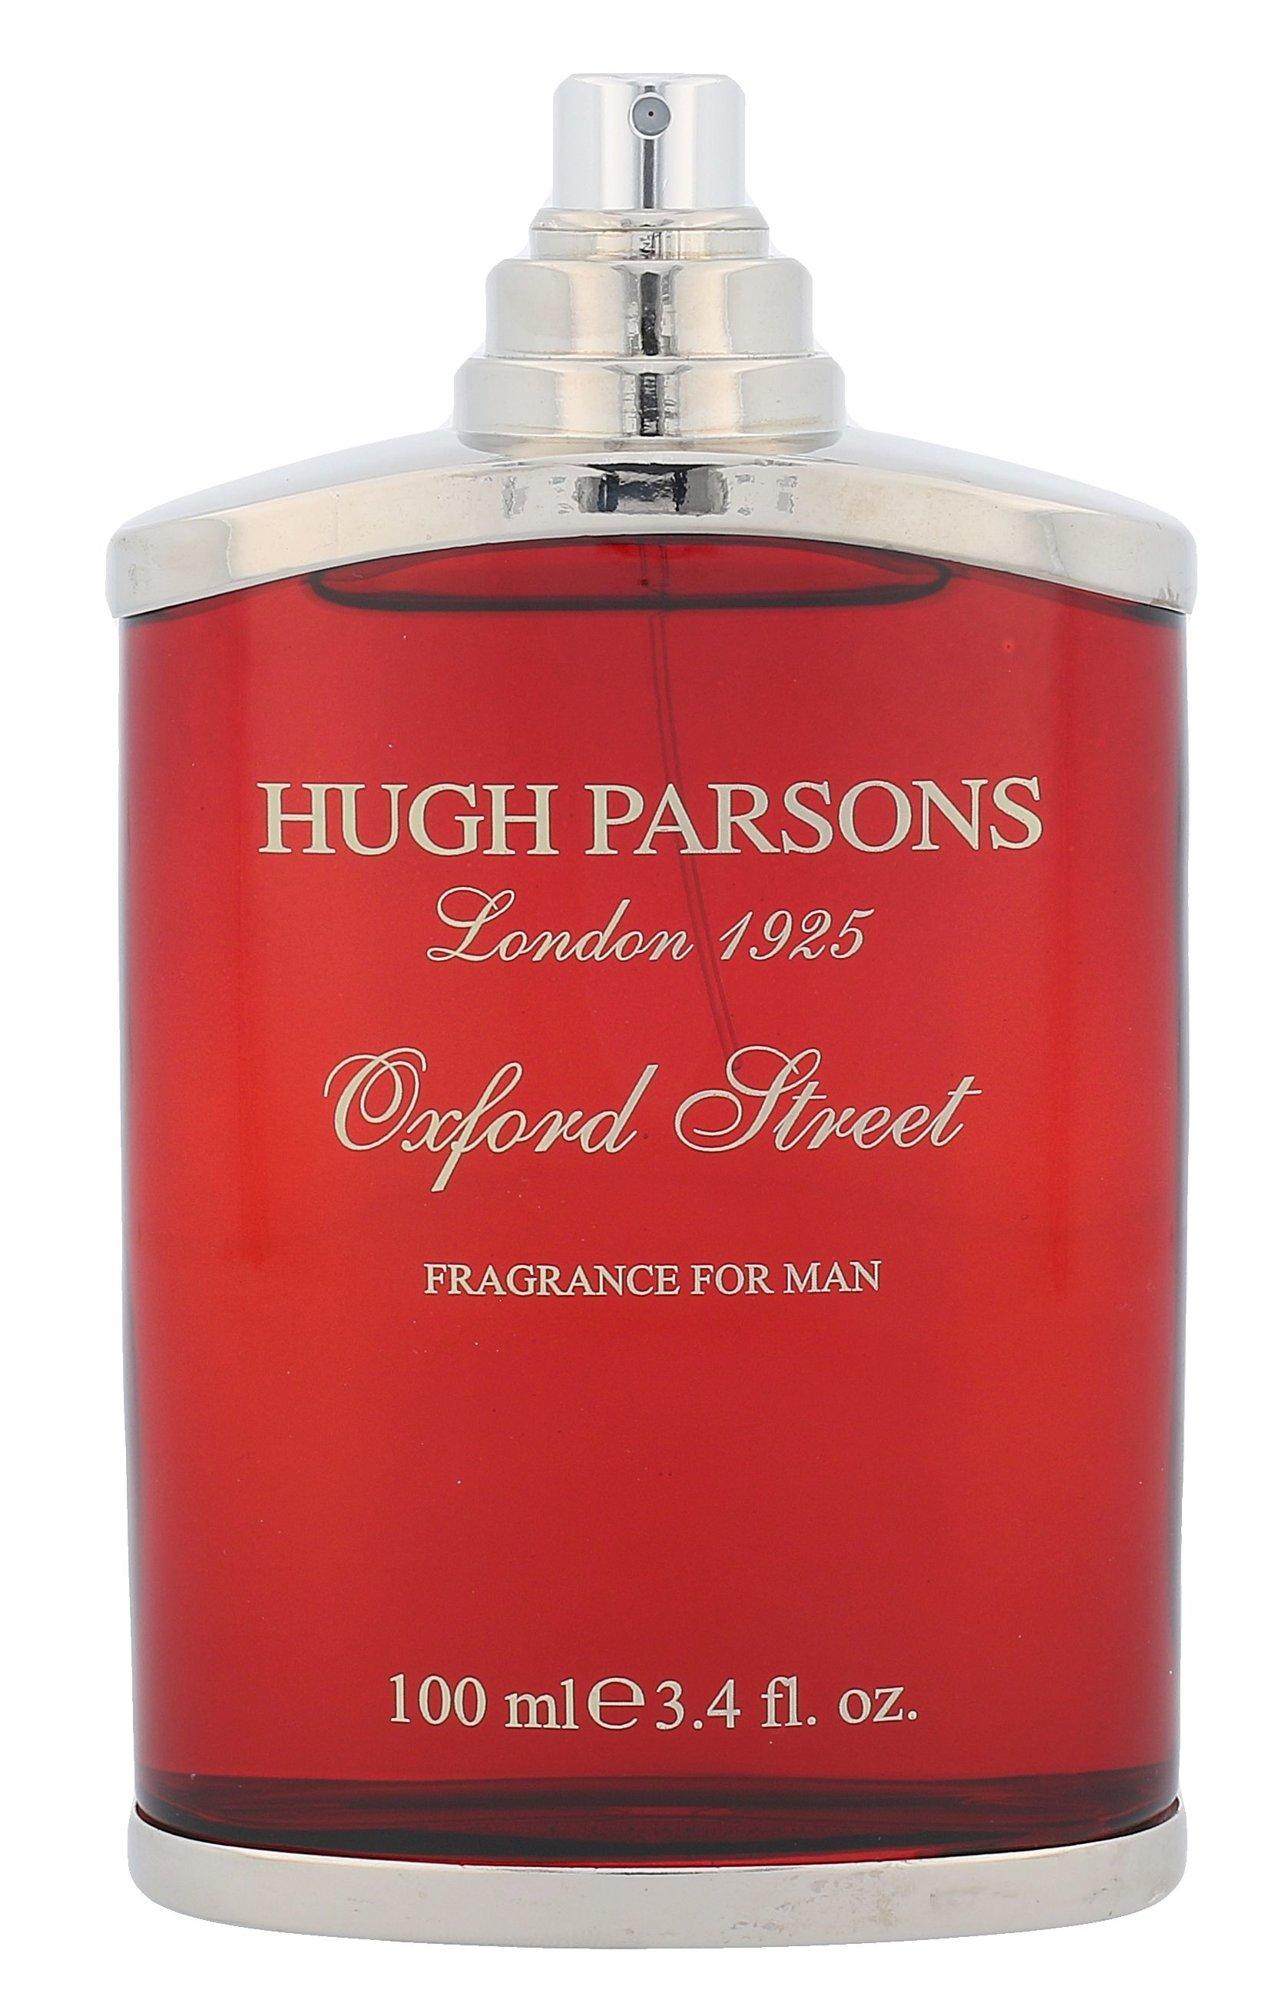 Hugh Parsons Oxford Street EDT 100ml